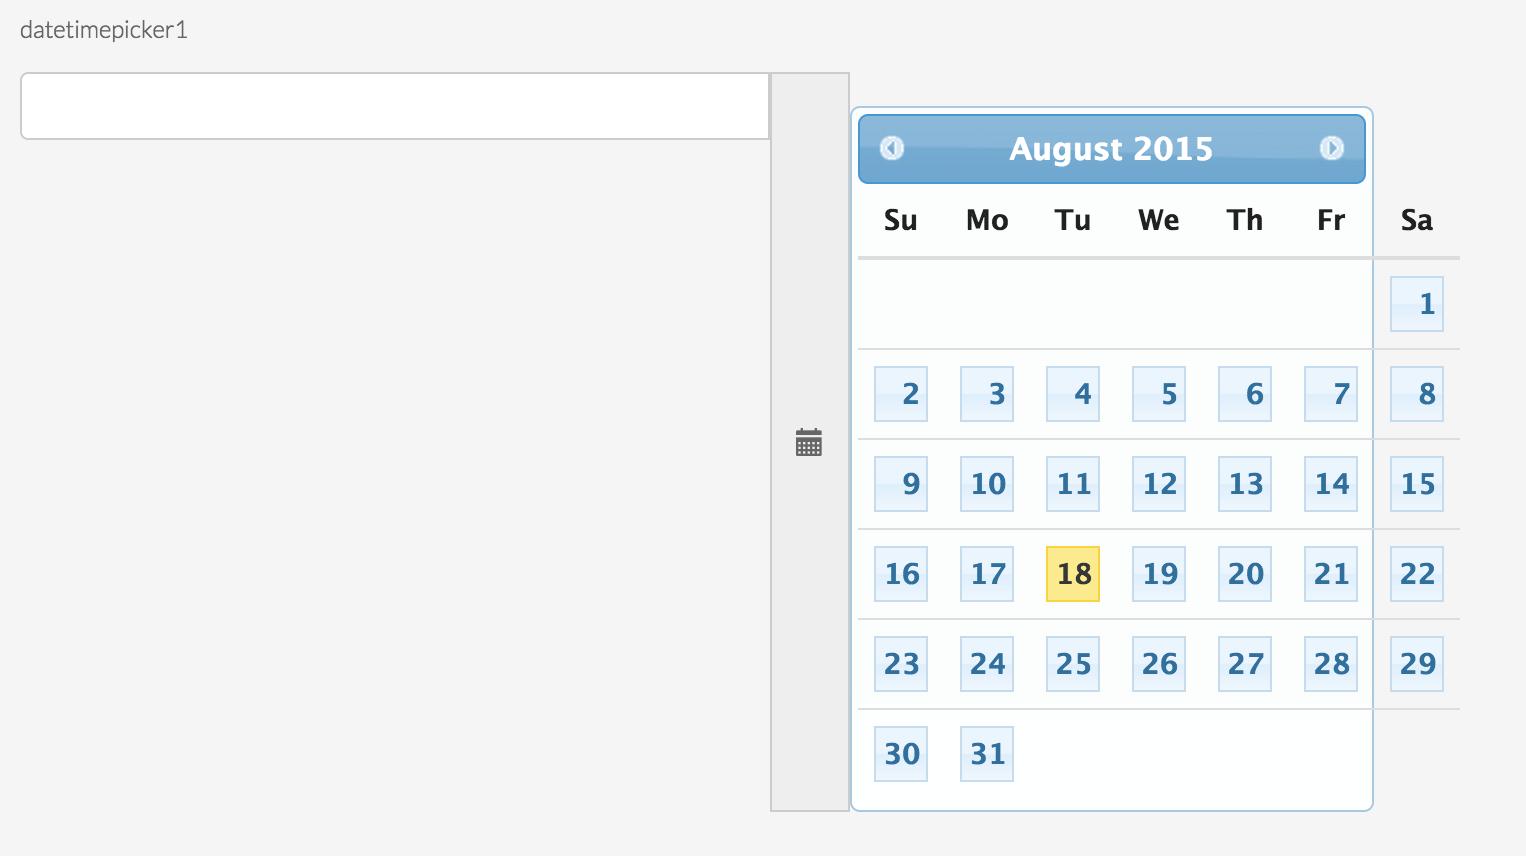 Bootstrap3 Calendar Is Not Working  Stack Overflow regarding Glyphicon-Calendar Not Showing